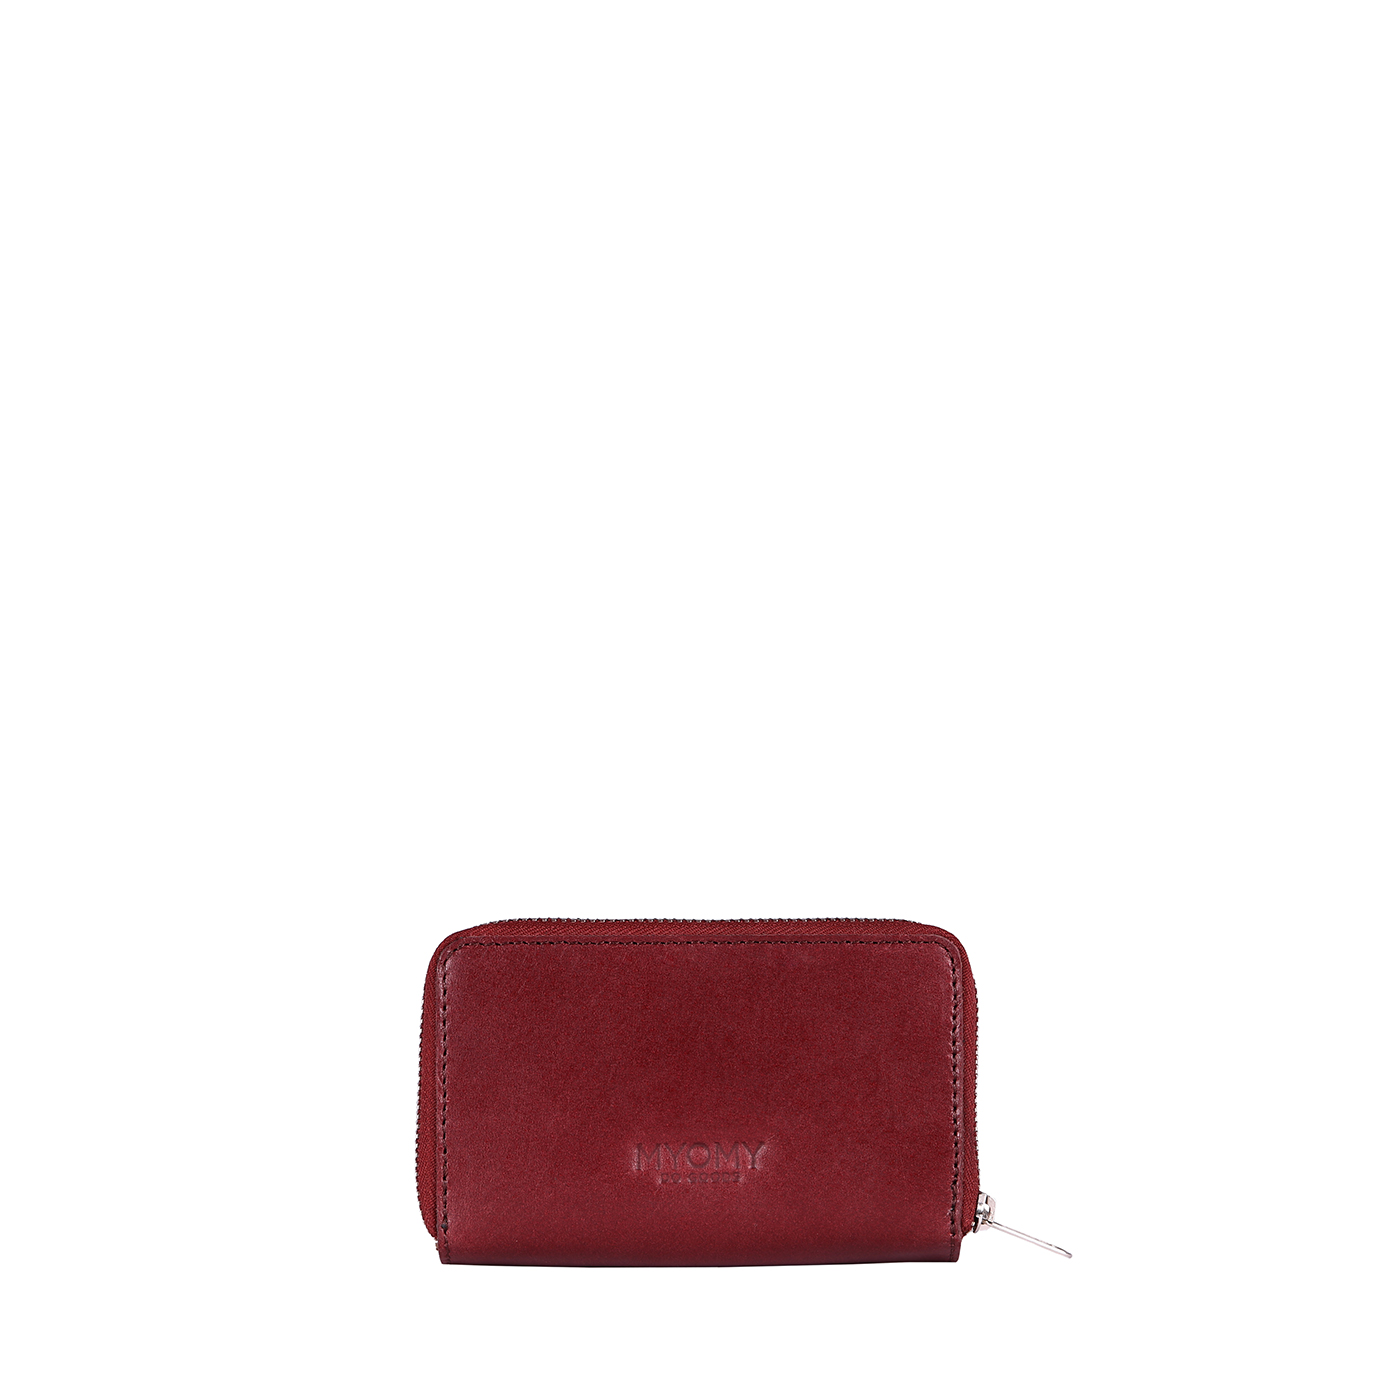 MY PAPER BAG Wallet Medium (RFID) - hunter waxy burgundy